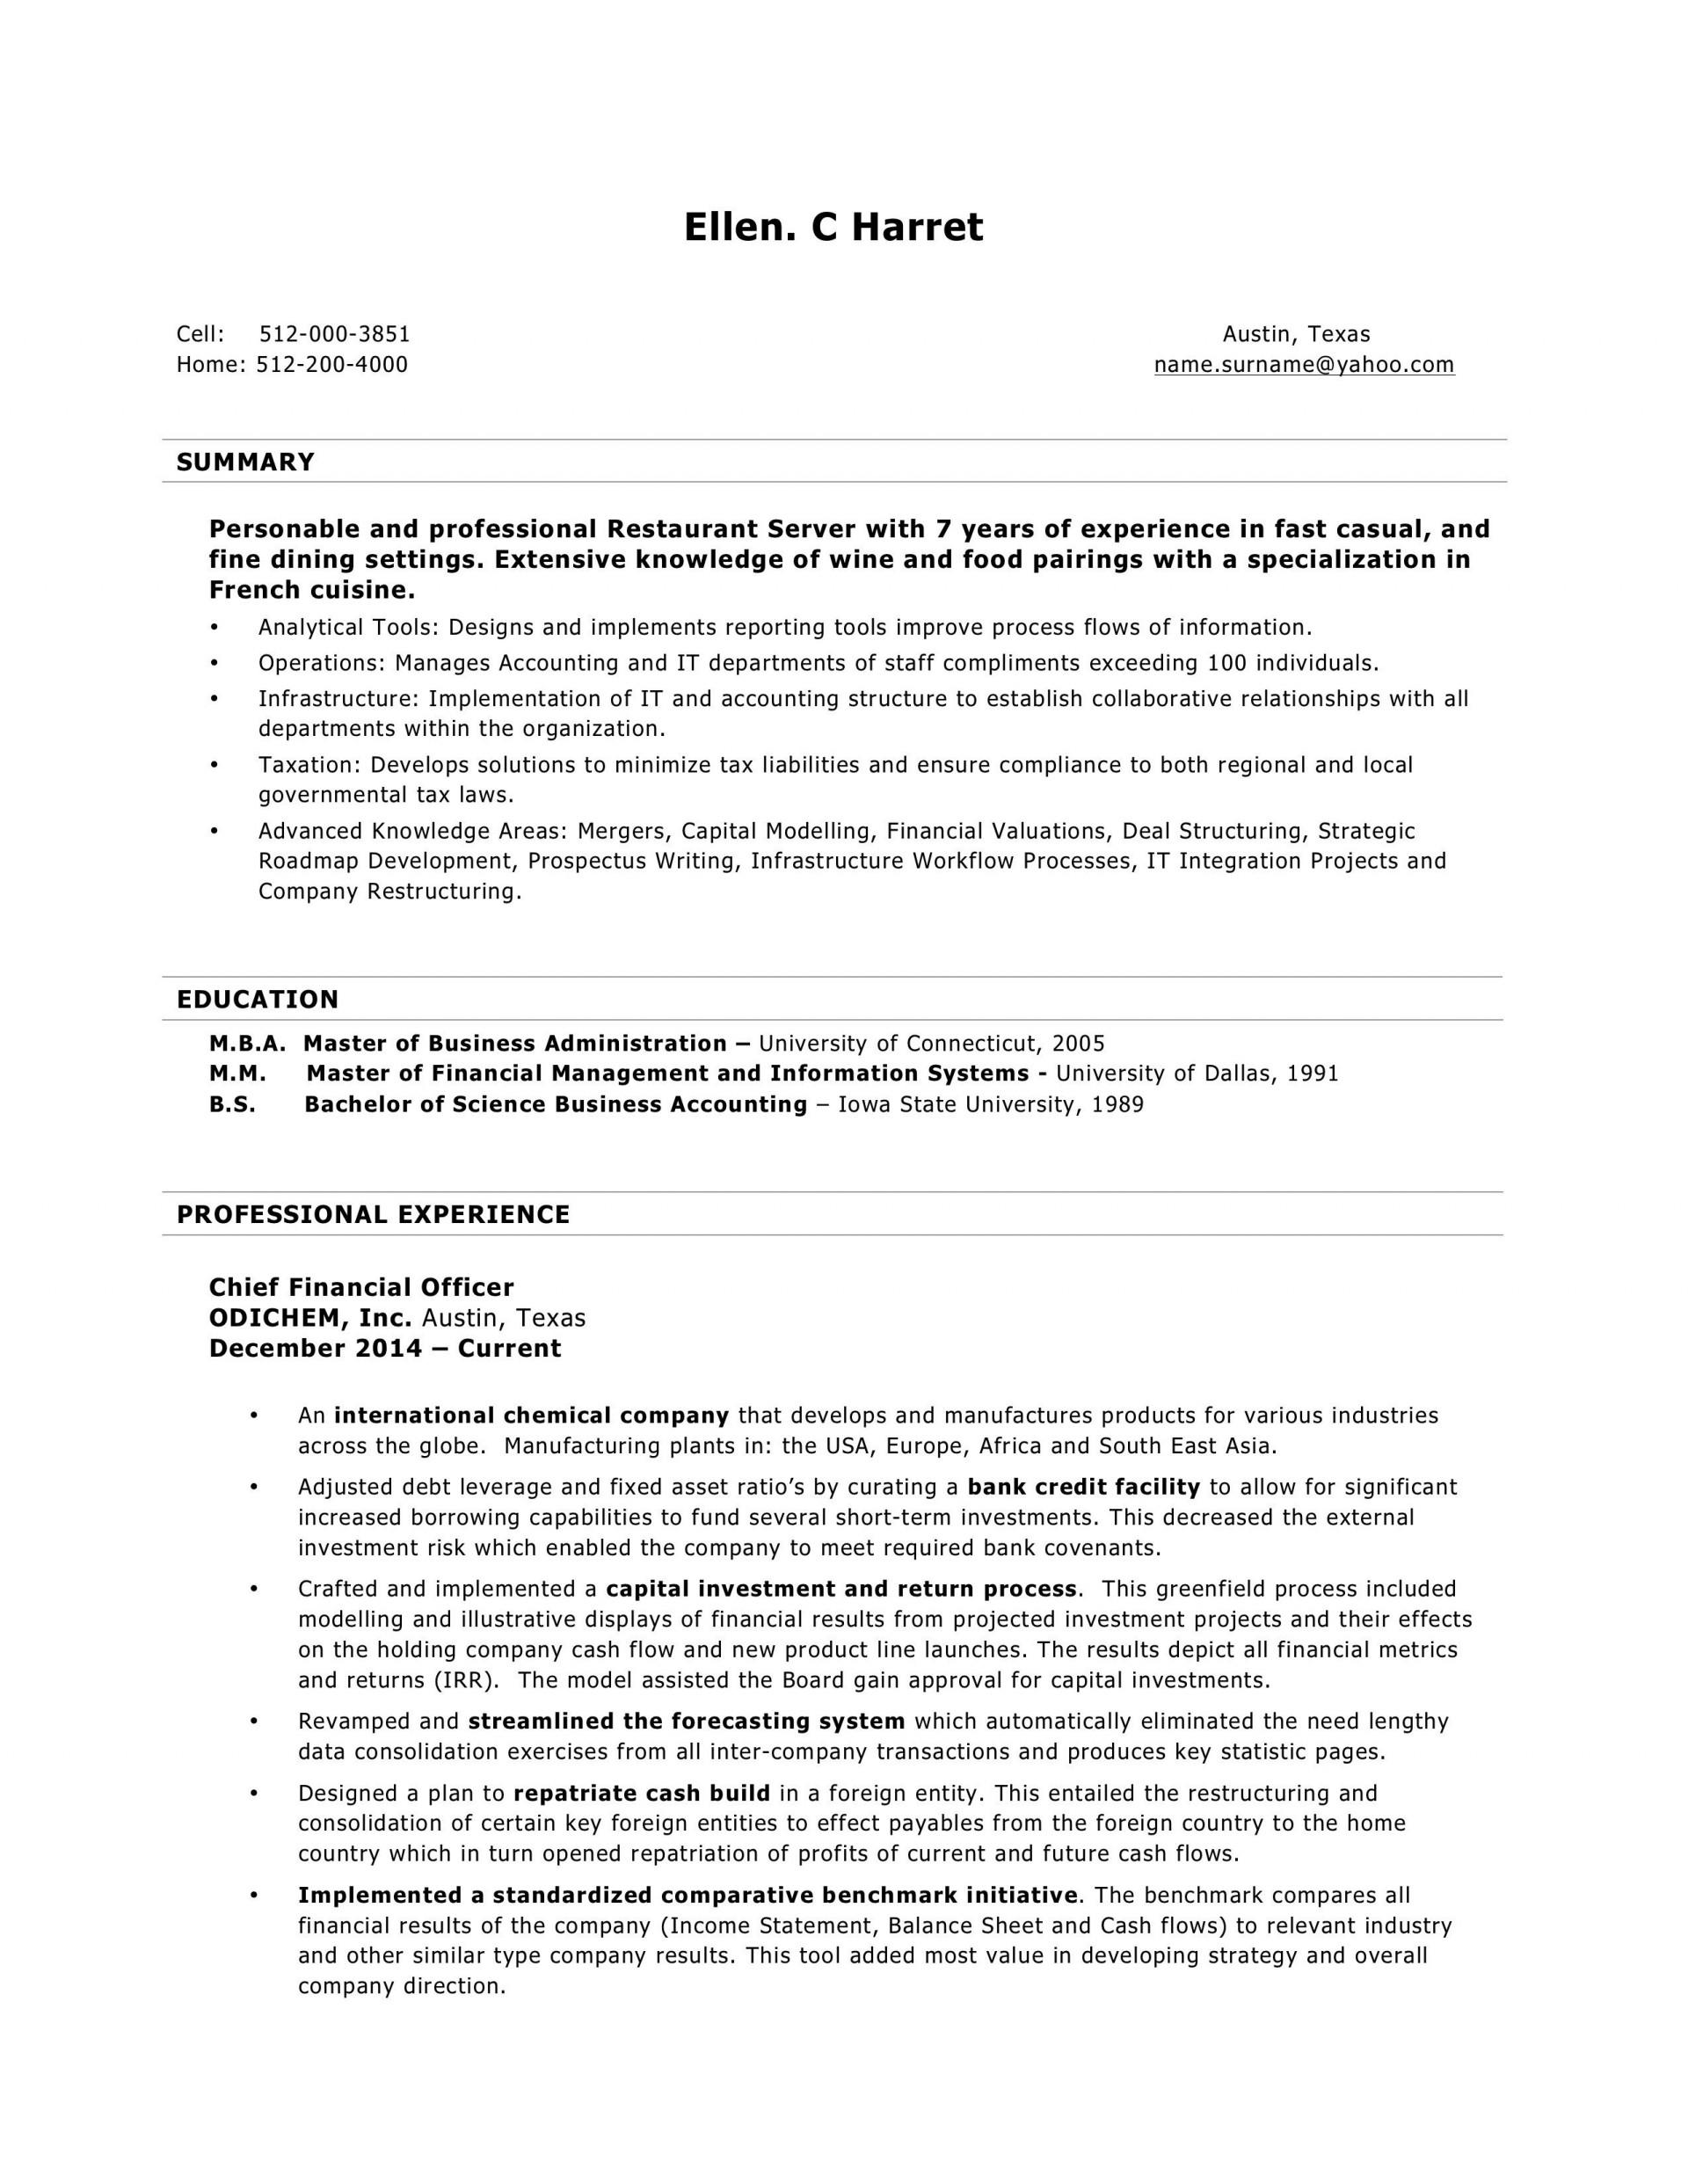 007 Best Resume Template On Microsoft Word Image  Sample 2007 Cv 20101920